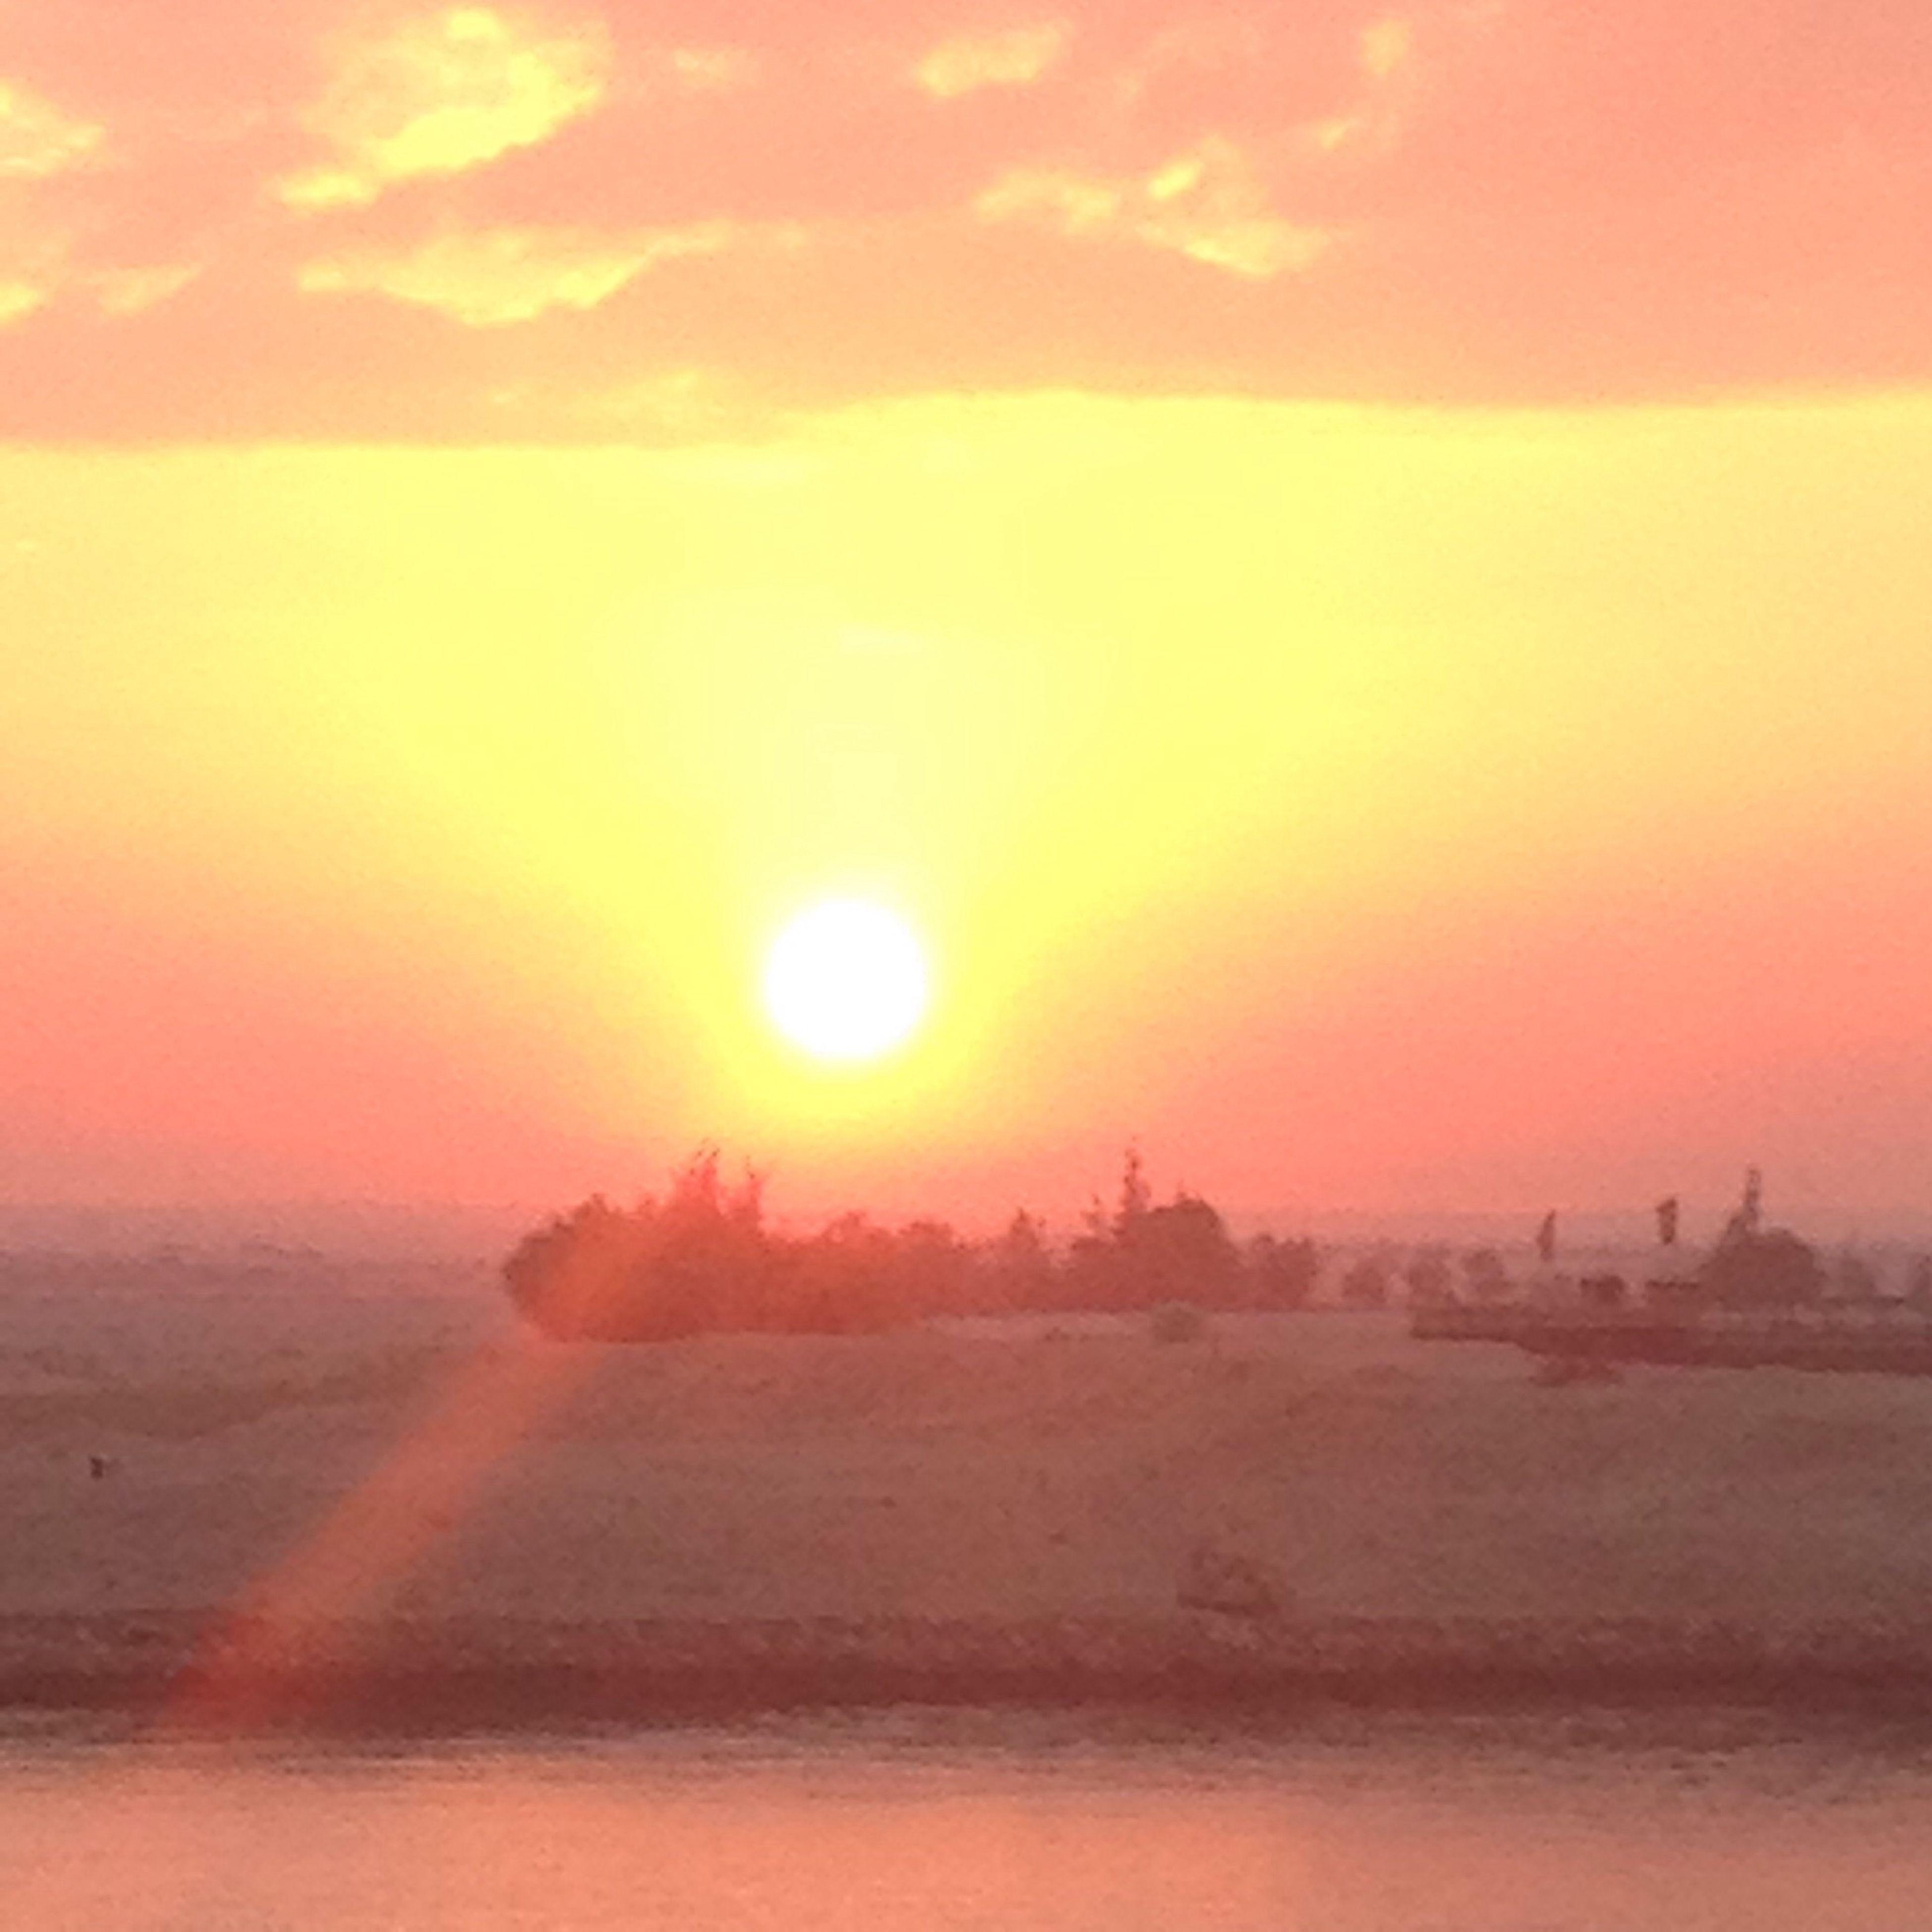 sunset, sun, orange color, scenics, tranquil scene, beauty in nature, tranquility, sky, idyllic, landscape, nature, sunlight, cloud - sky, sunbeam, outdoors, lens flare, dramatic sky, no people, remote, non-urban scene